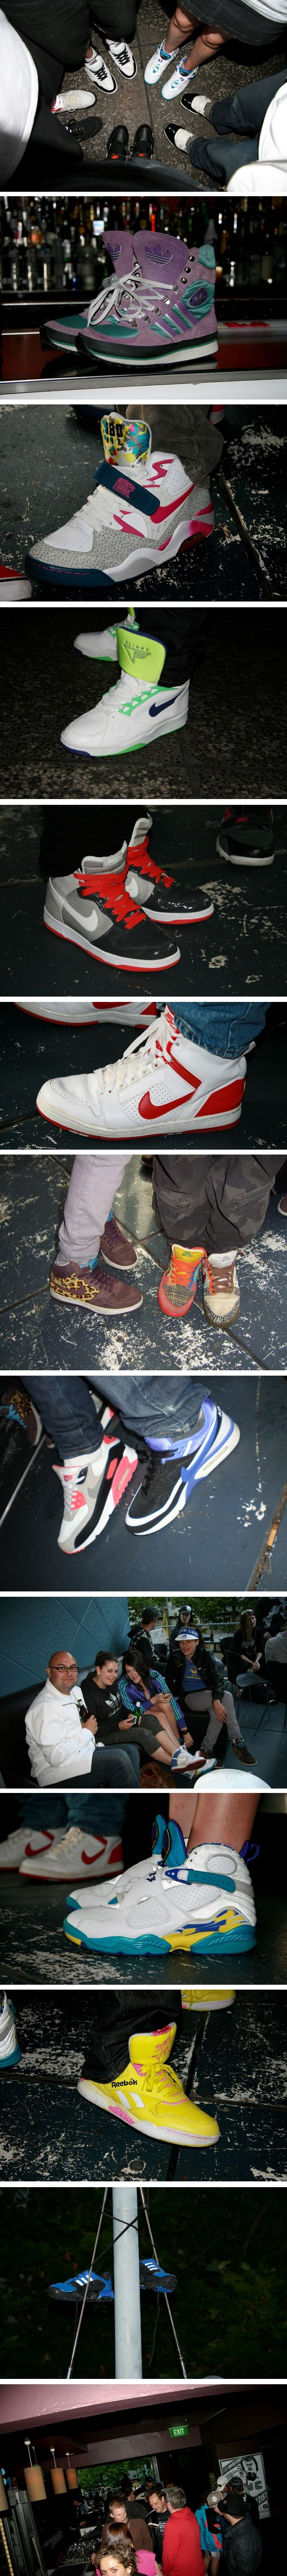 Hobart Sneaker Swap Meet 2